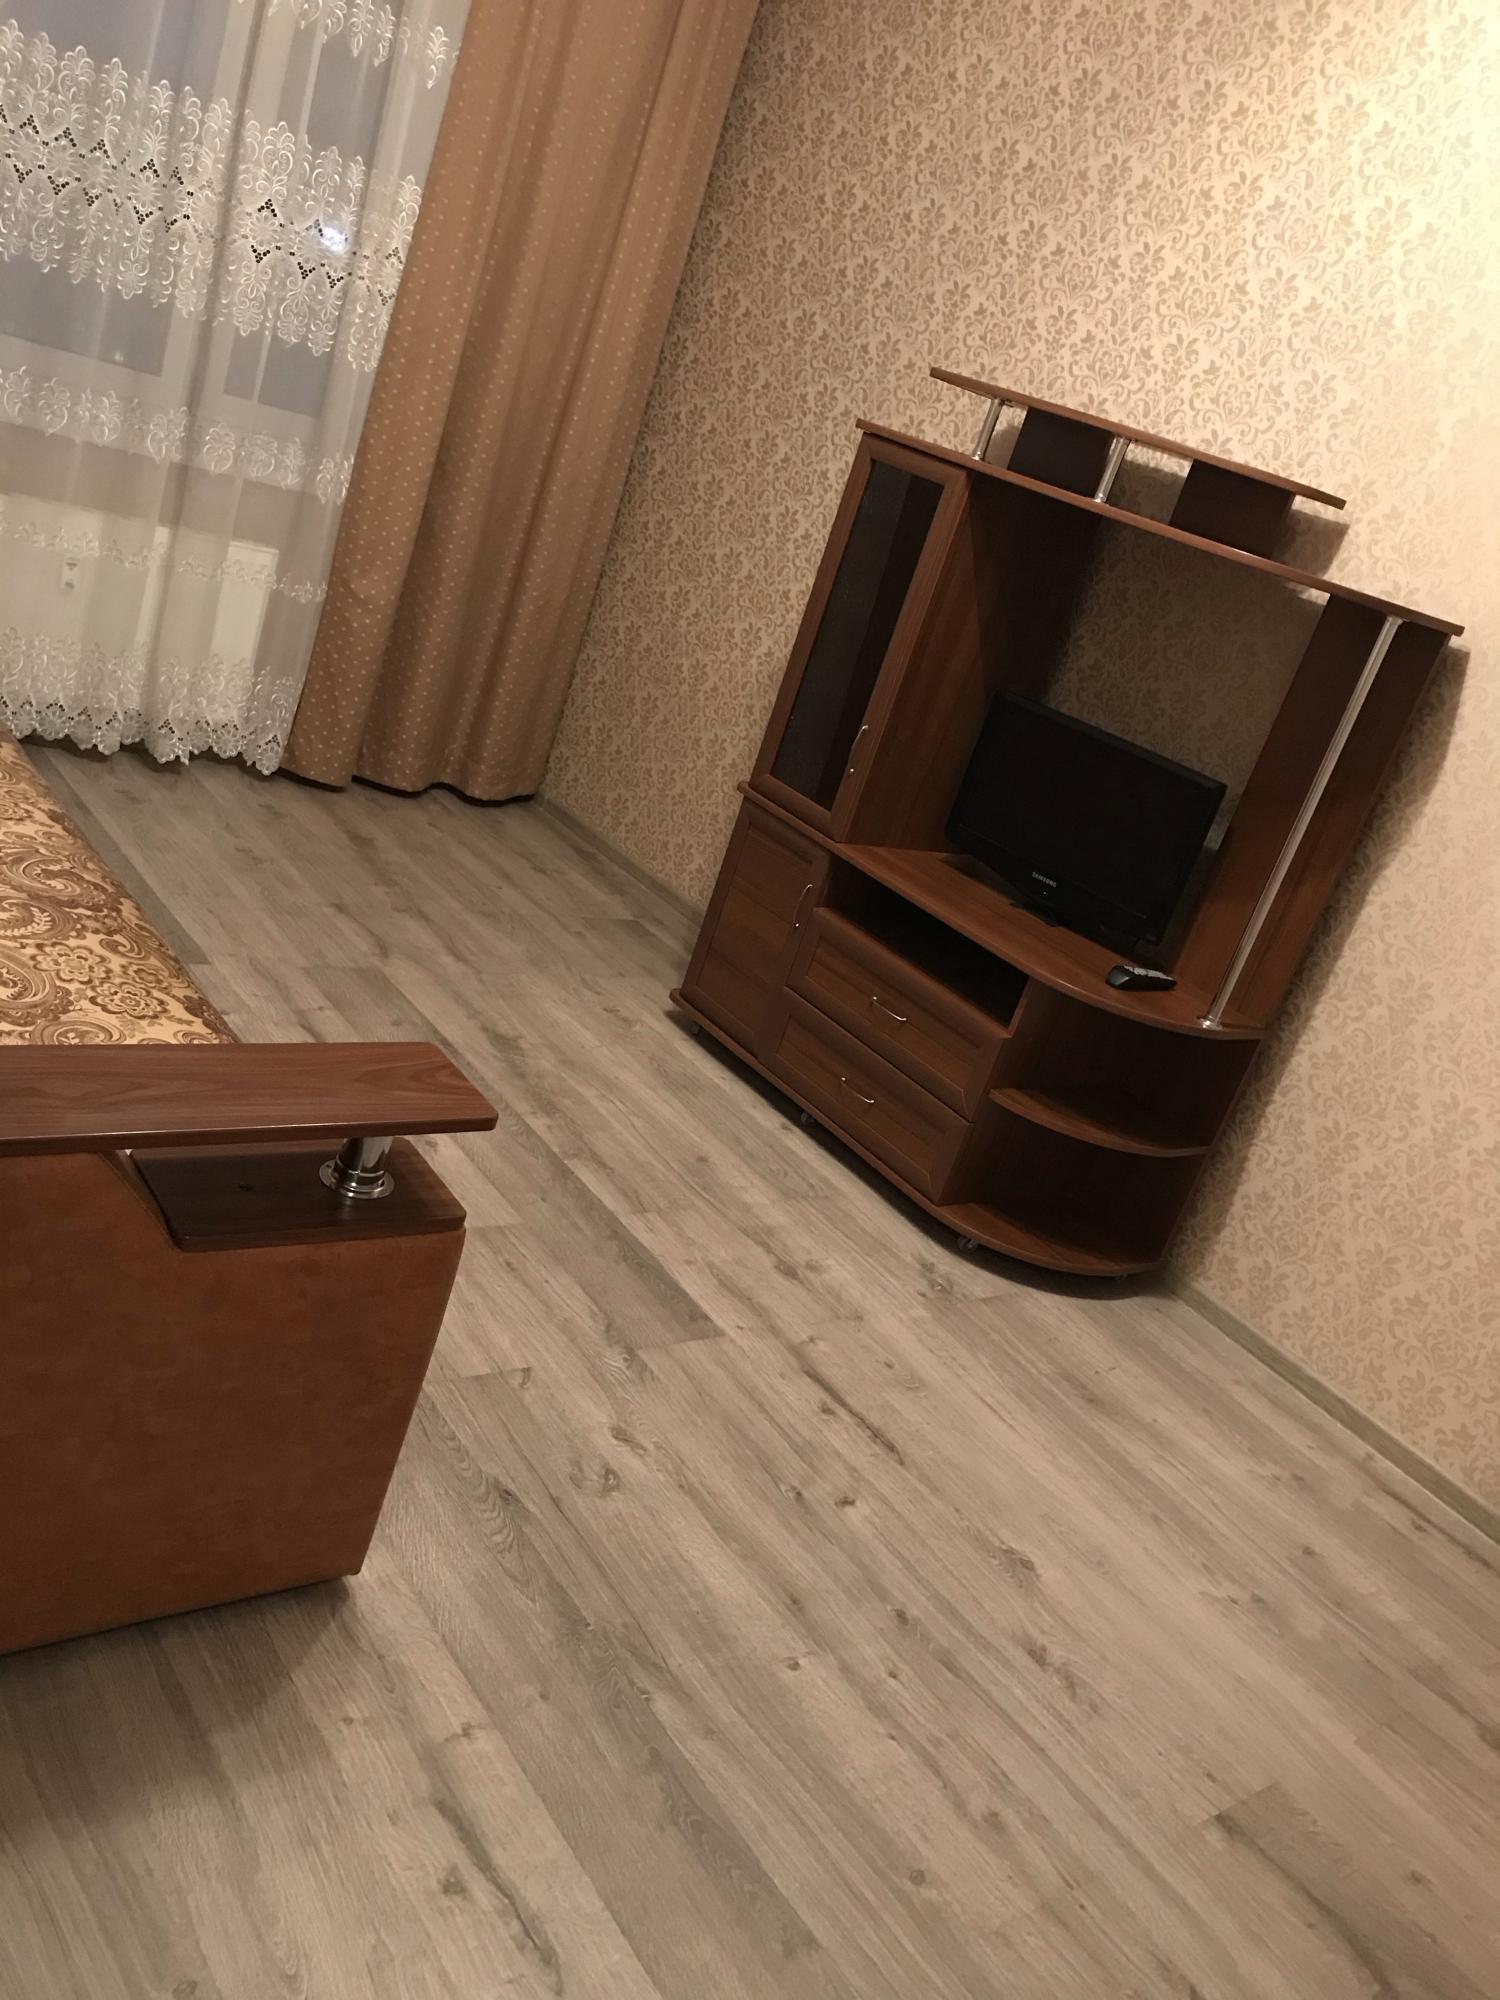 Квартира, 1 комната, 35 м² 89258601492 купить 3